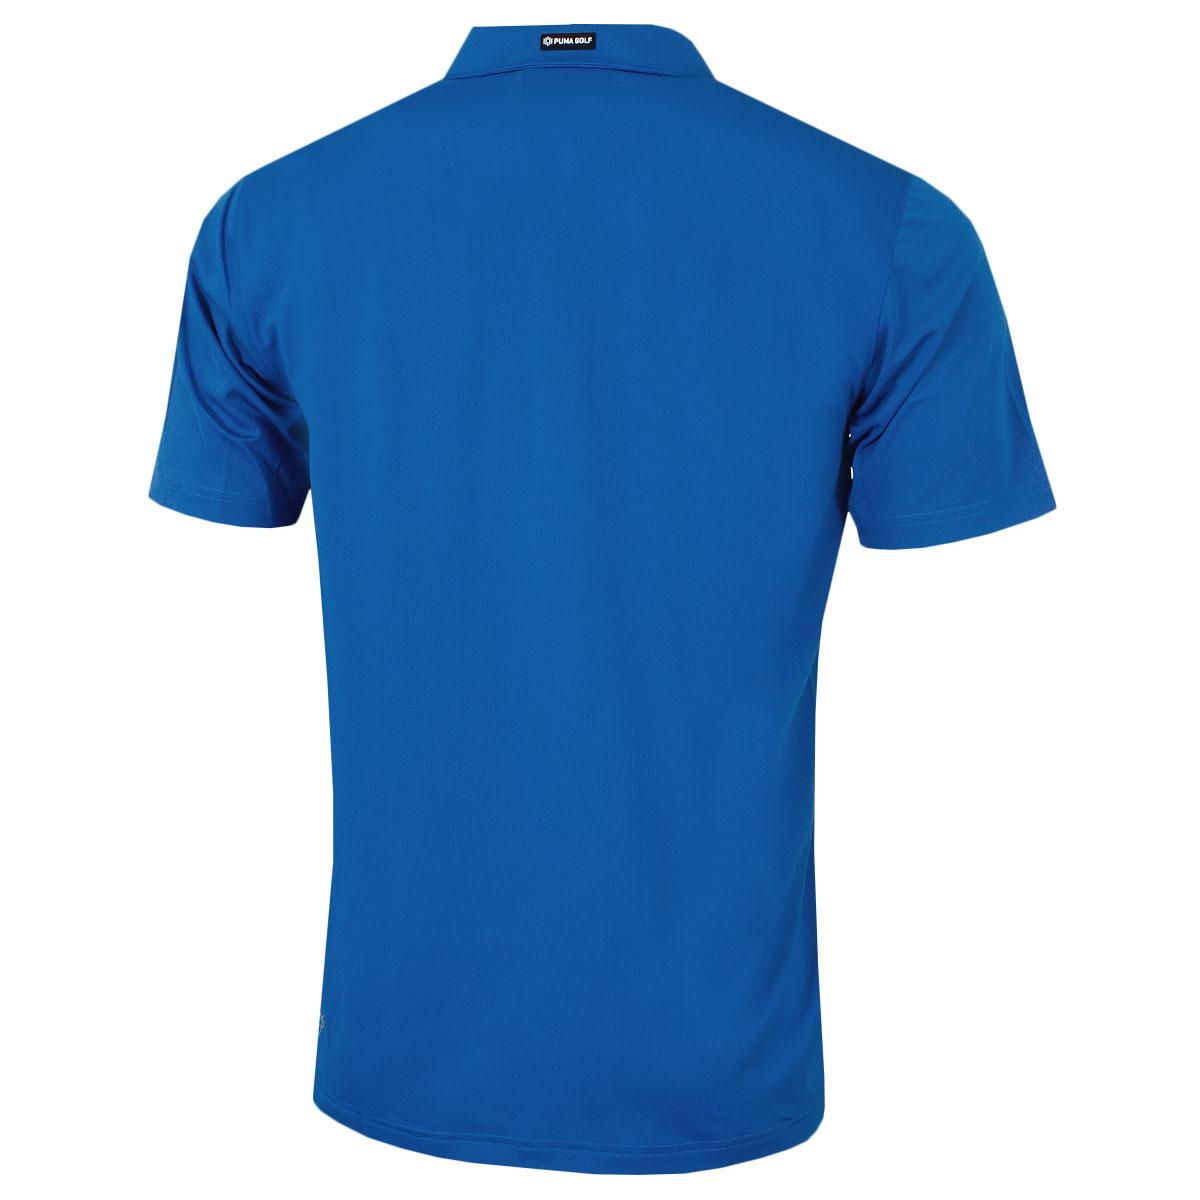 Puma-Golf-Mens-Essential-Pounce-Cresting-DryCell-Tech-Polo-Shirt-46-OFF-RRP thumbnail 15